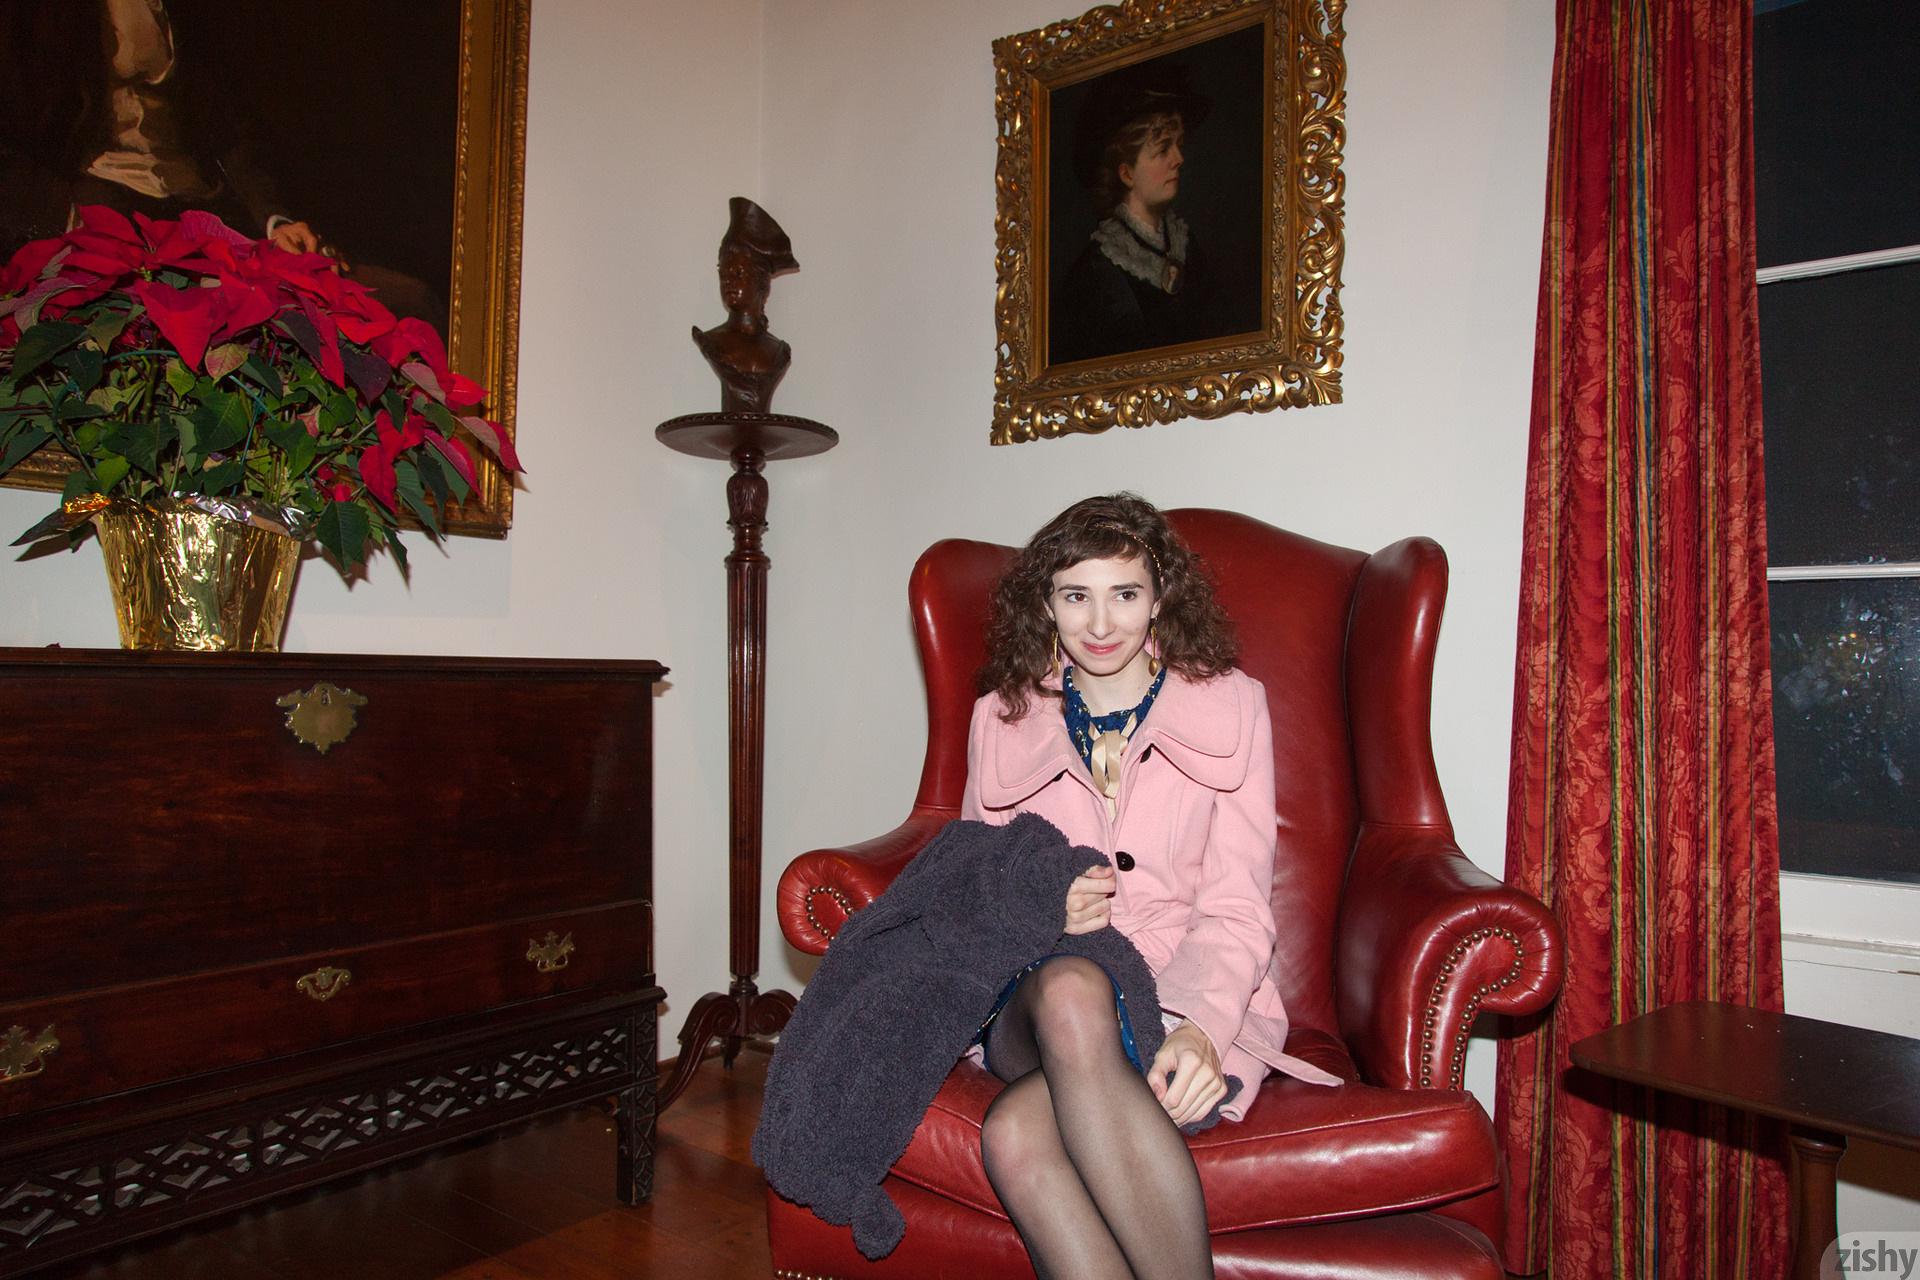 Yvette Nolot At Arizona Inn Zishy (14)